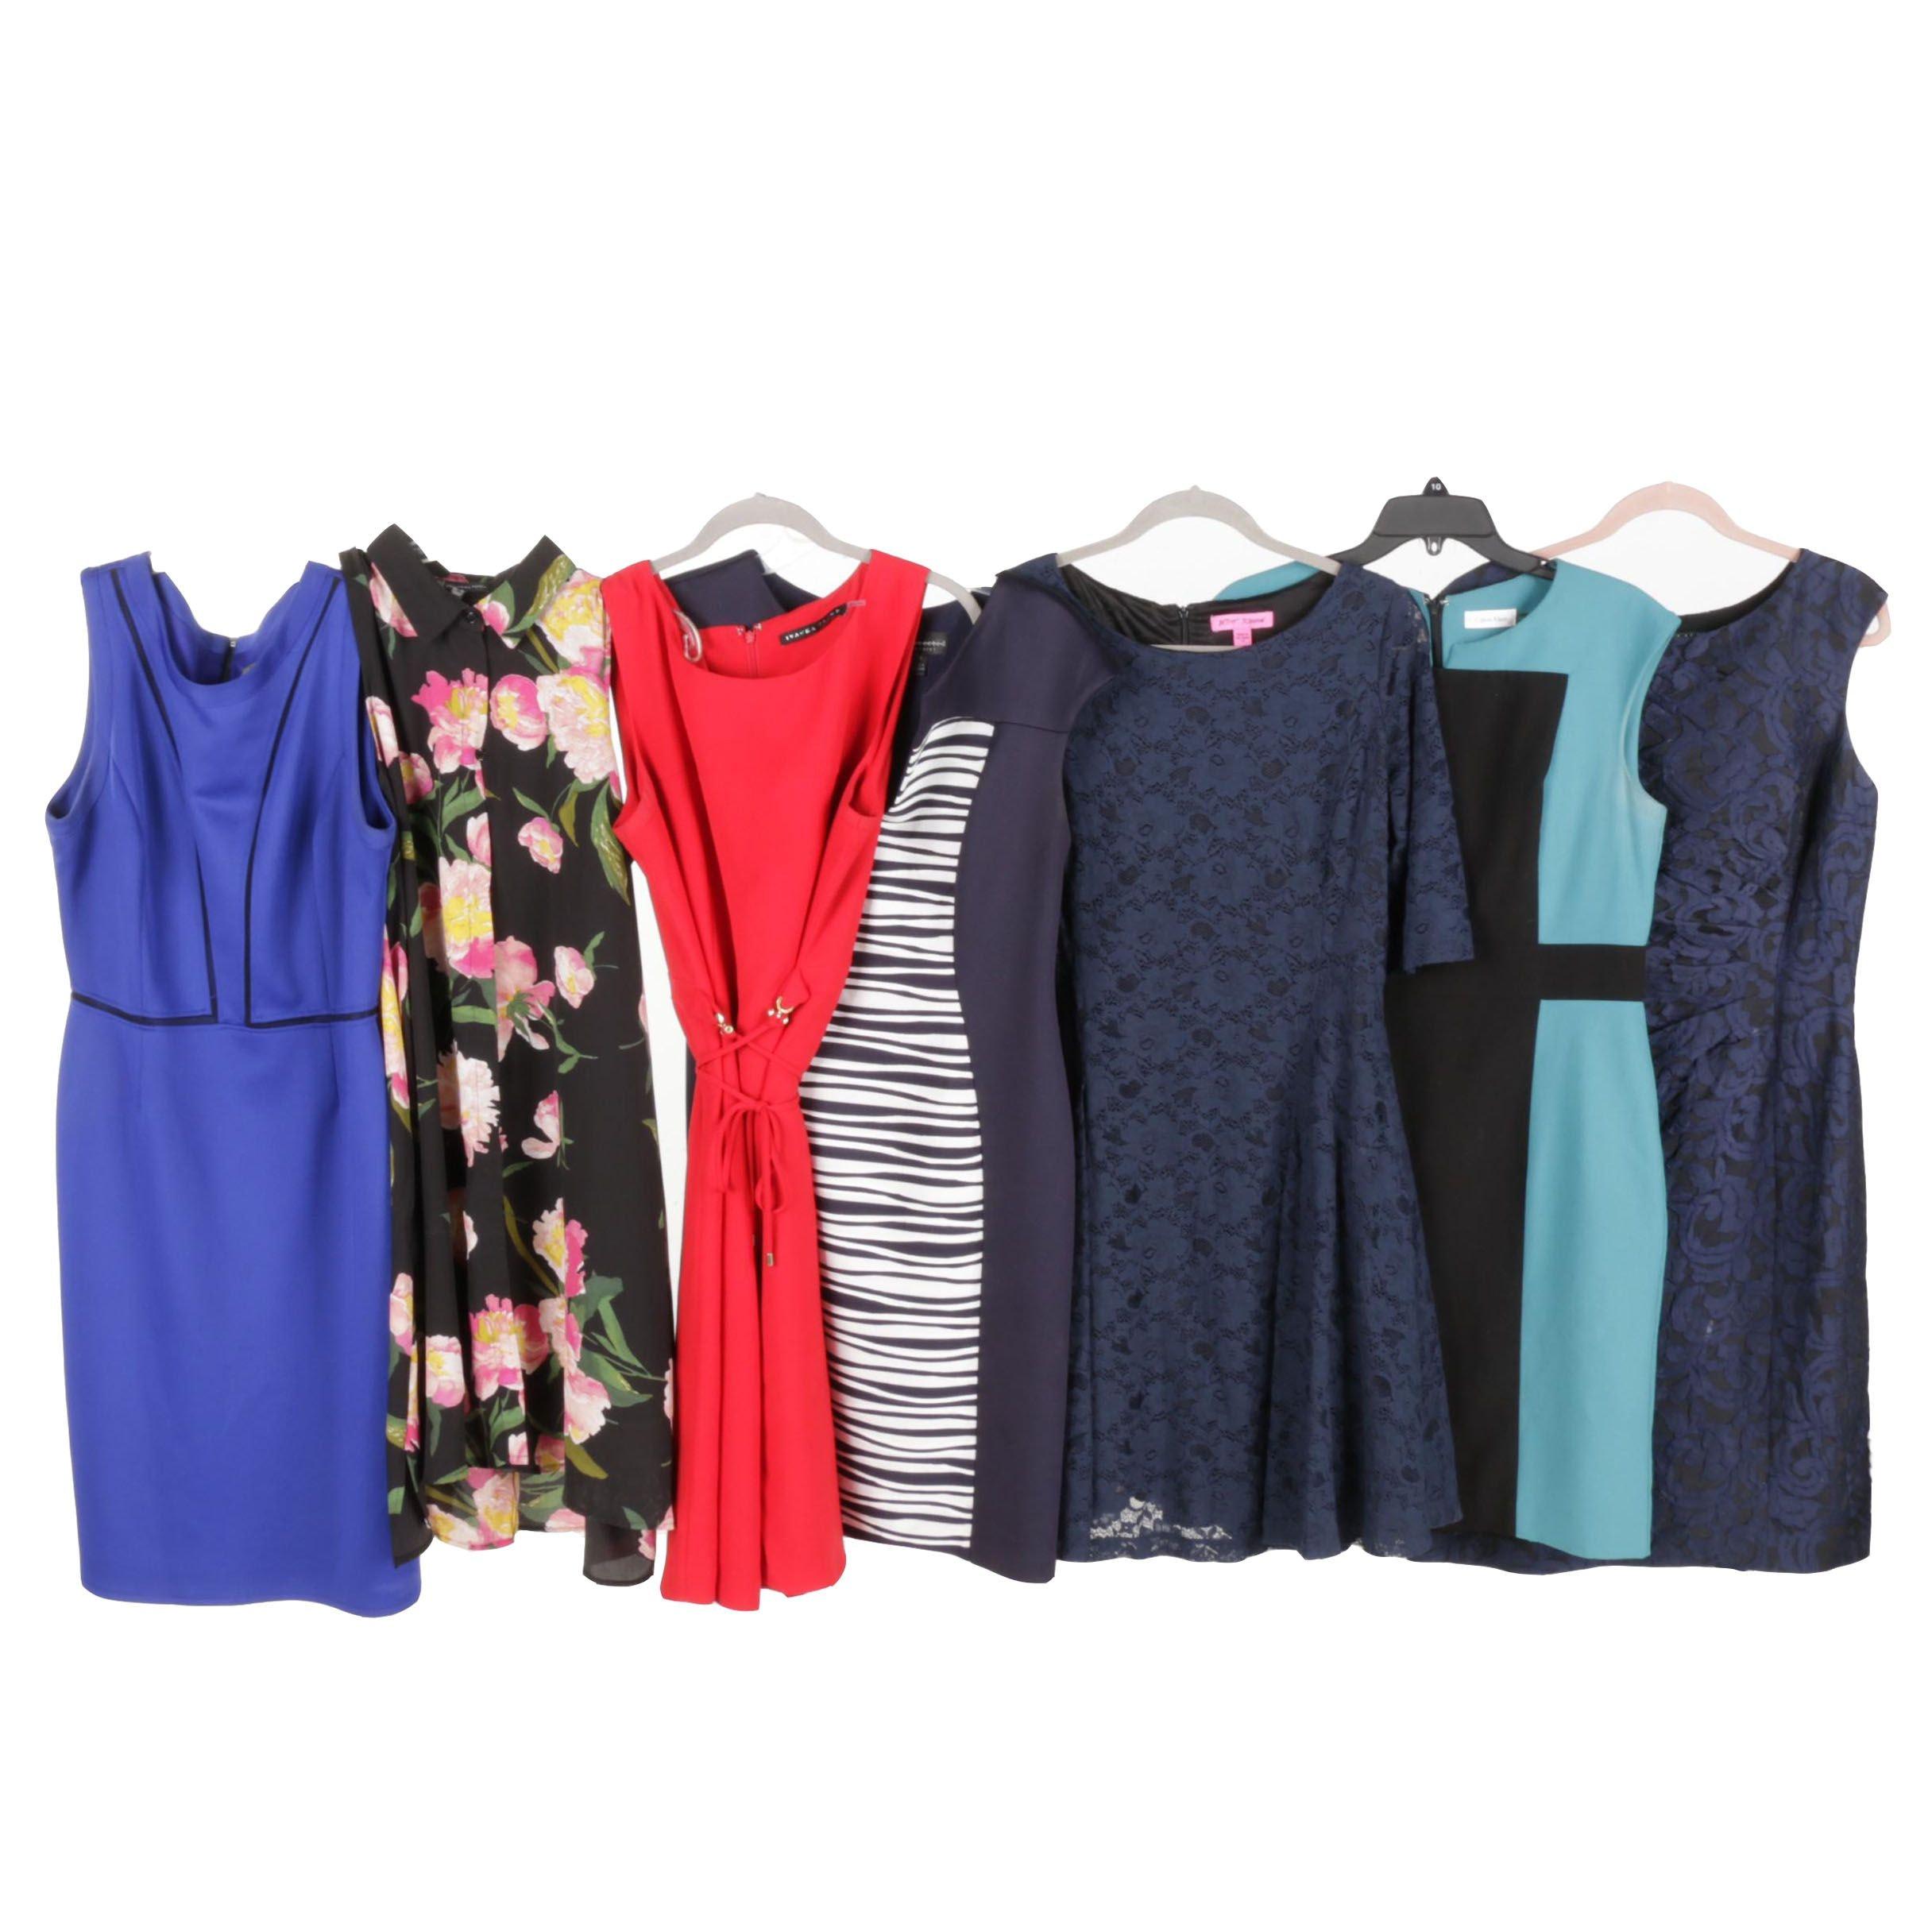 Dresses Including Betsey Johnson